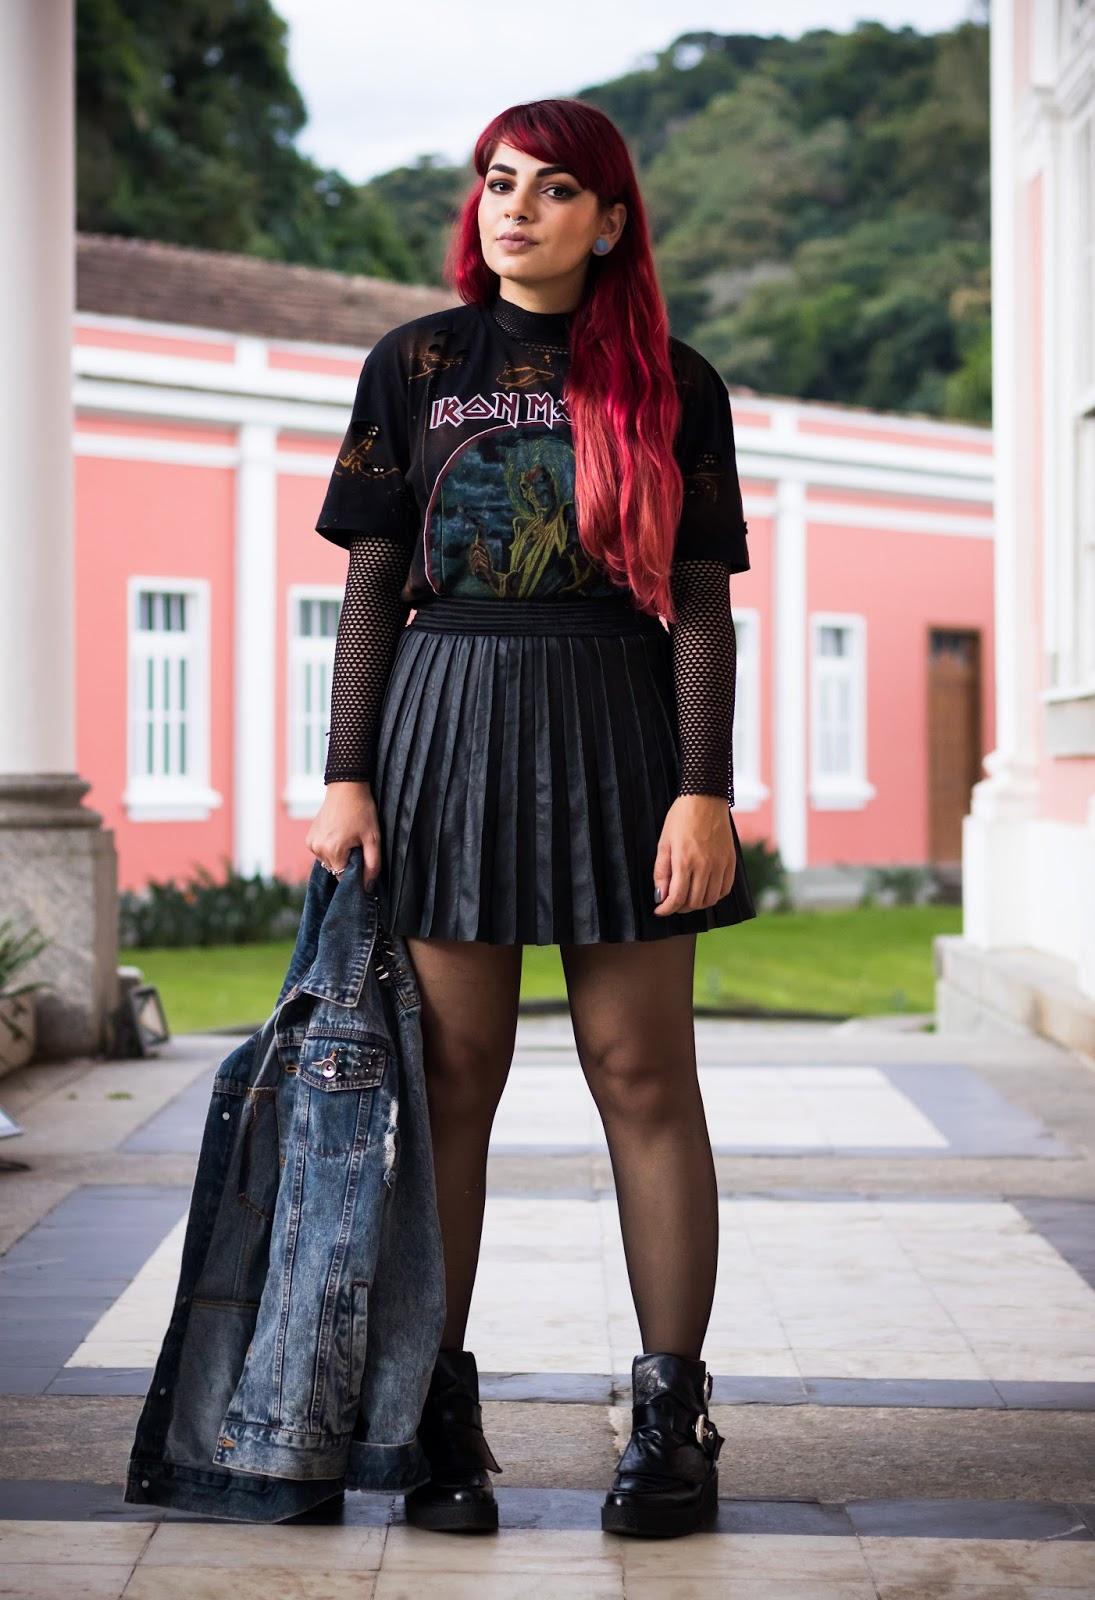 Street style legwear looks www.decoturnoespikes.com.br